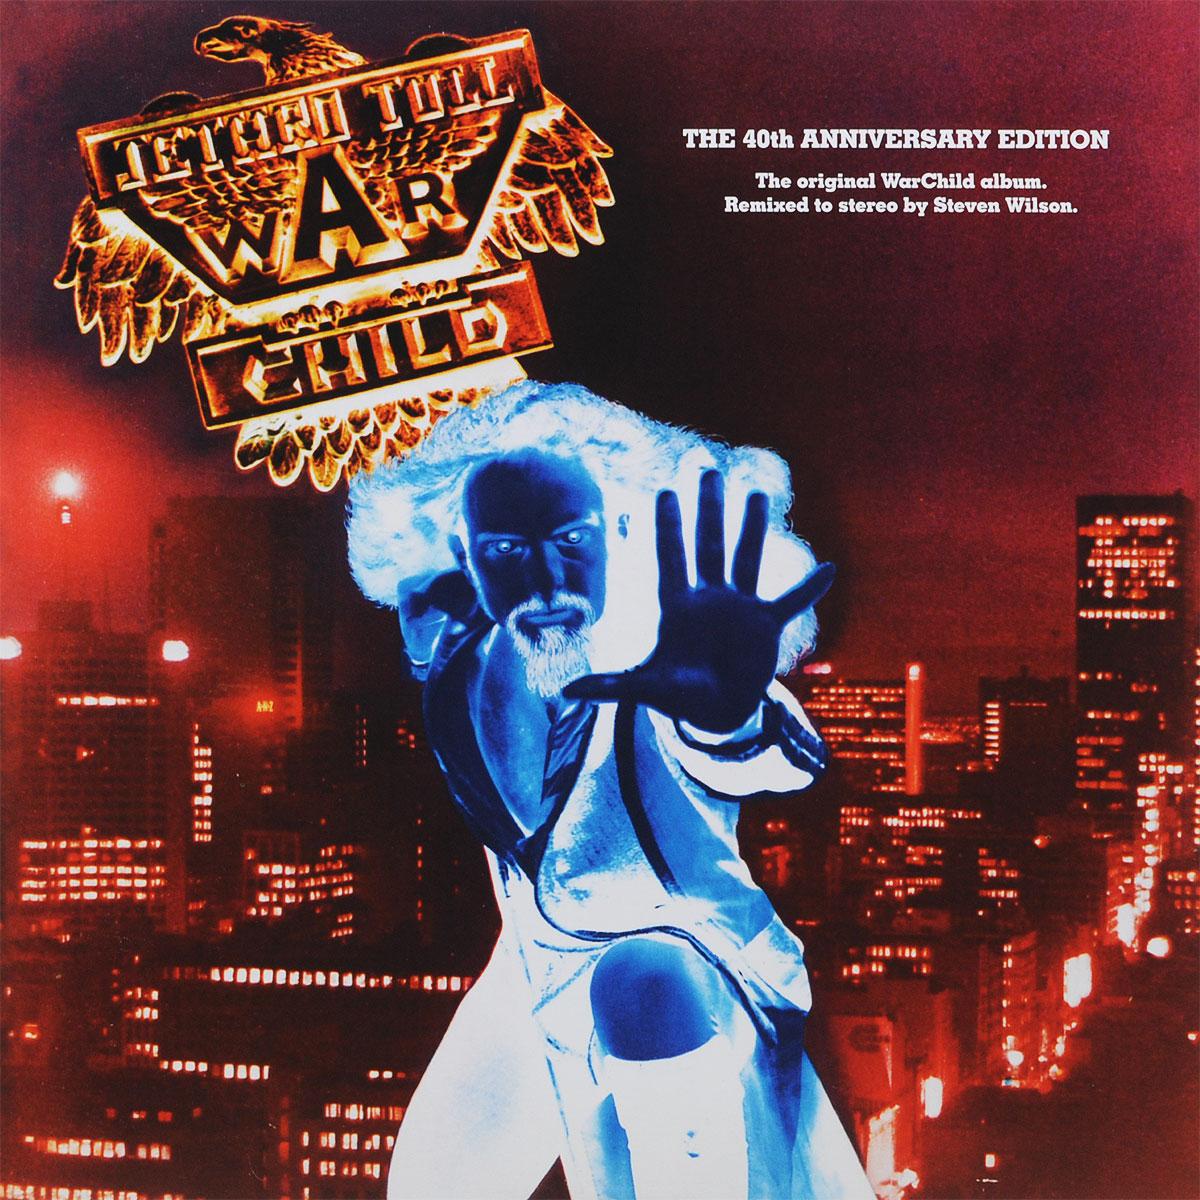 Jethro Tull Jethro Tull. Warchild (The 40th Anniversary Theatre Edition) (LP) roxy music roxy music the studio albums limited edition 8 lp